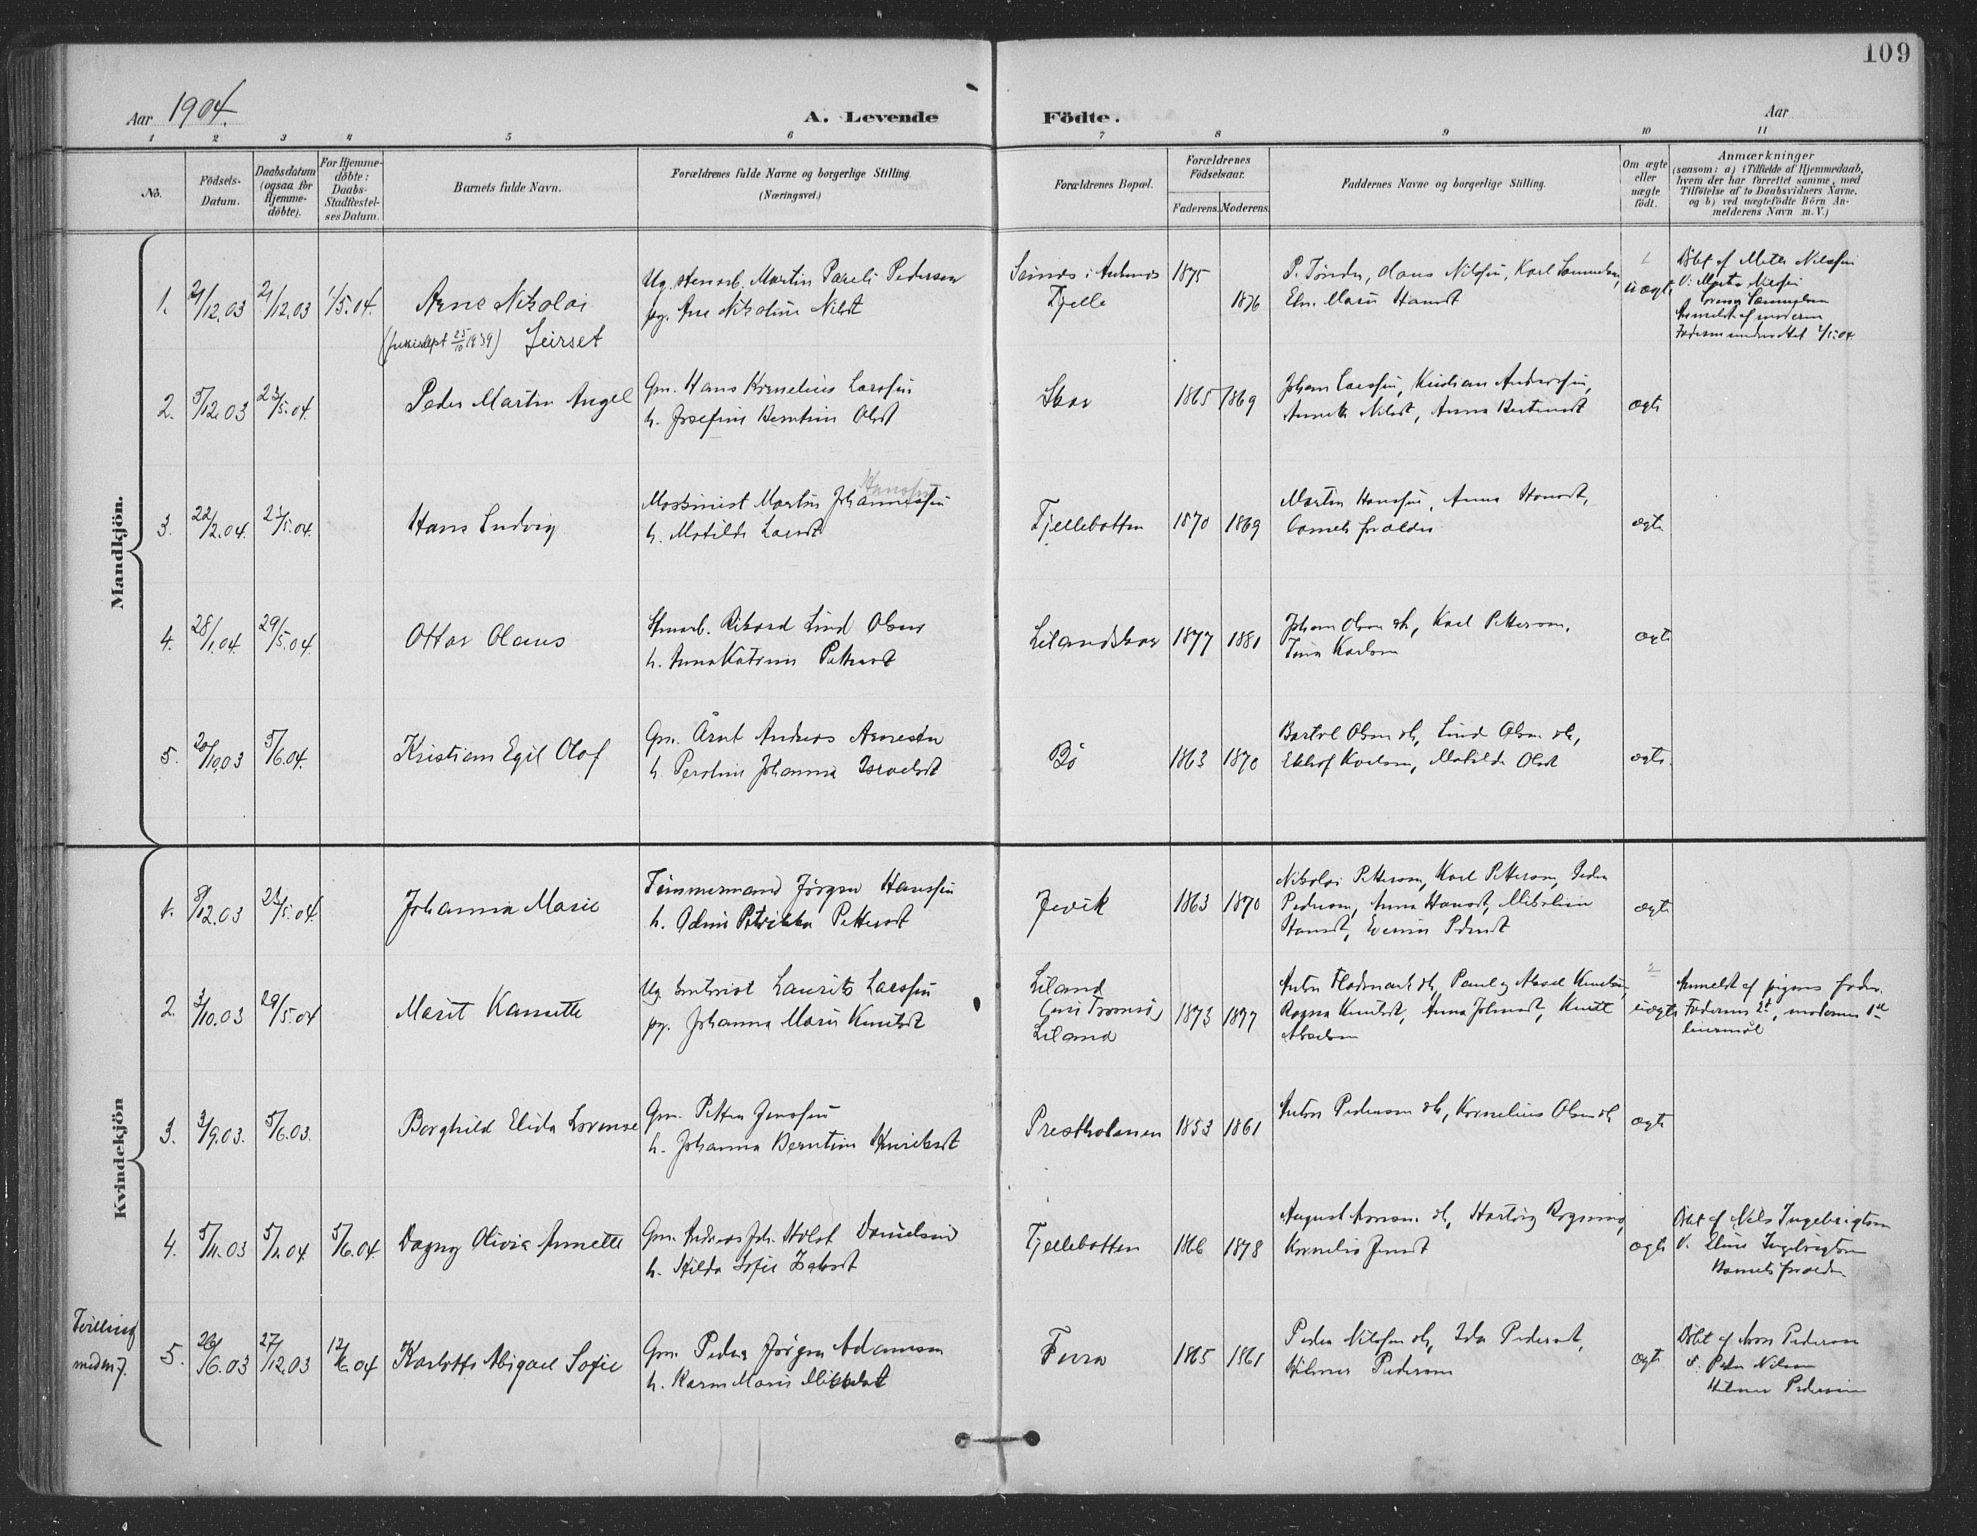 SAT, Ministerialprotokoller, klokkerbøker og fødselsregistre - Nordland, 863/L0899: Ministerialbok nr. 863A11, 1897-1906, s. 109